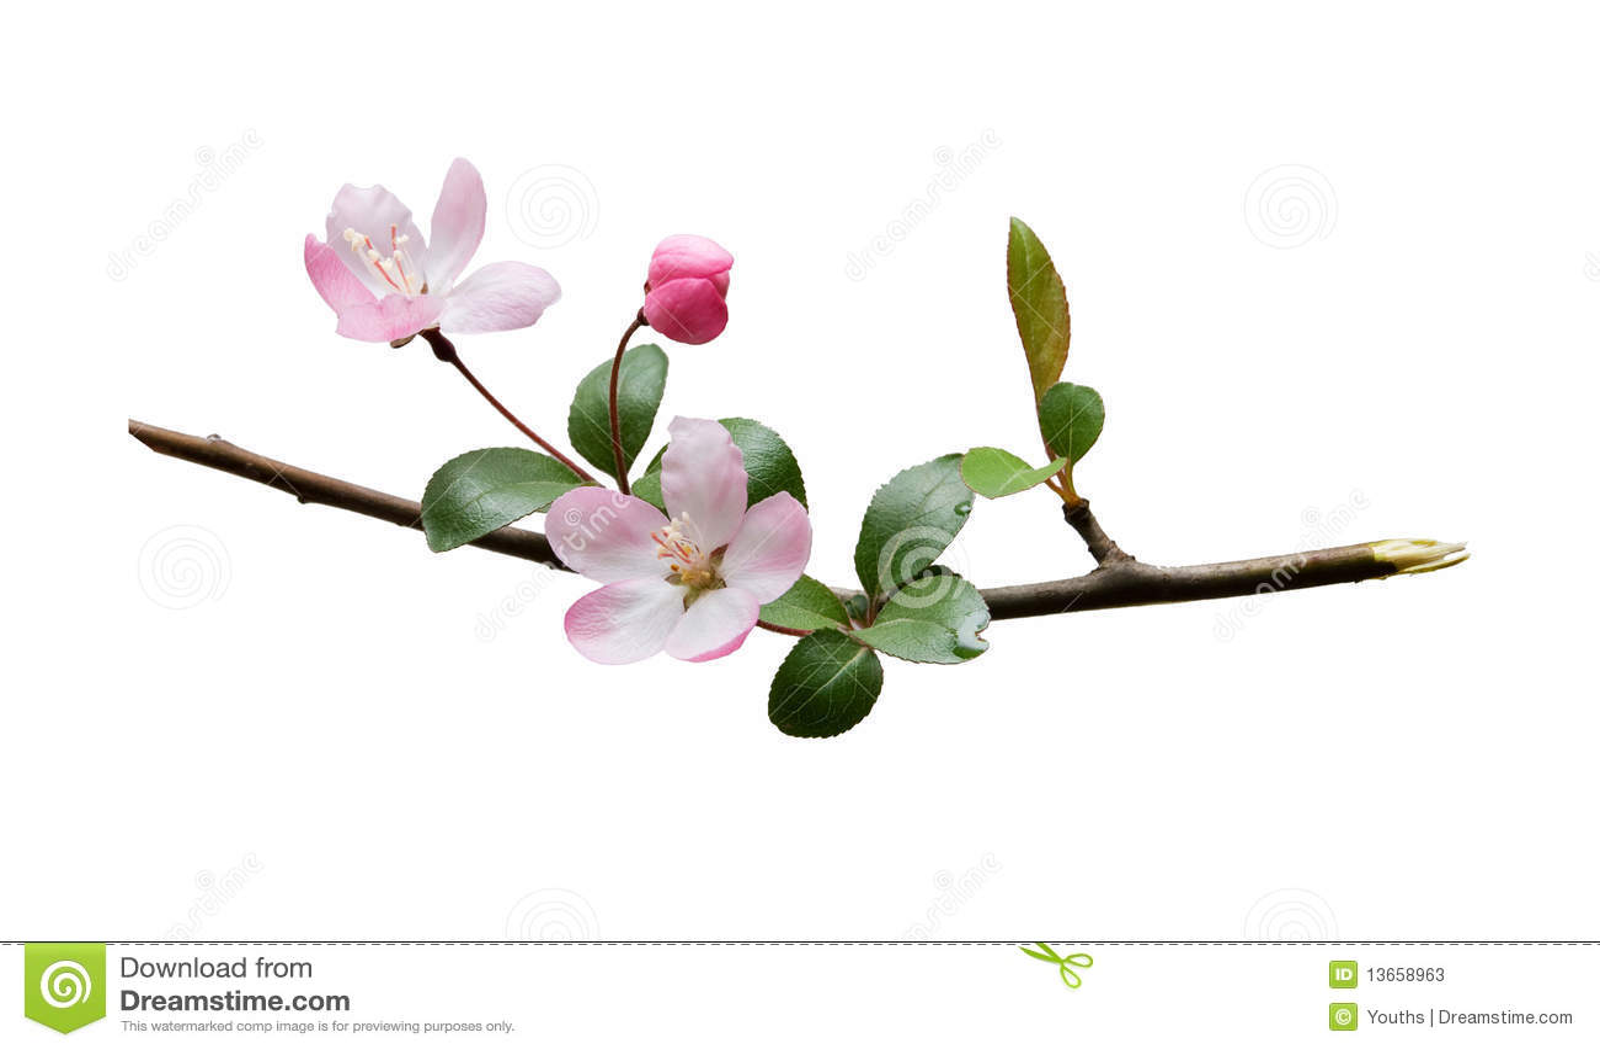 Plum blossom isolated on white background